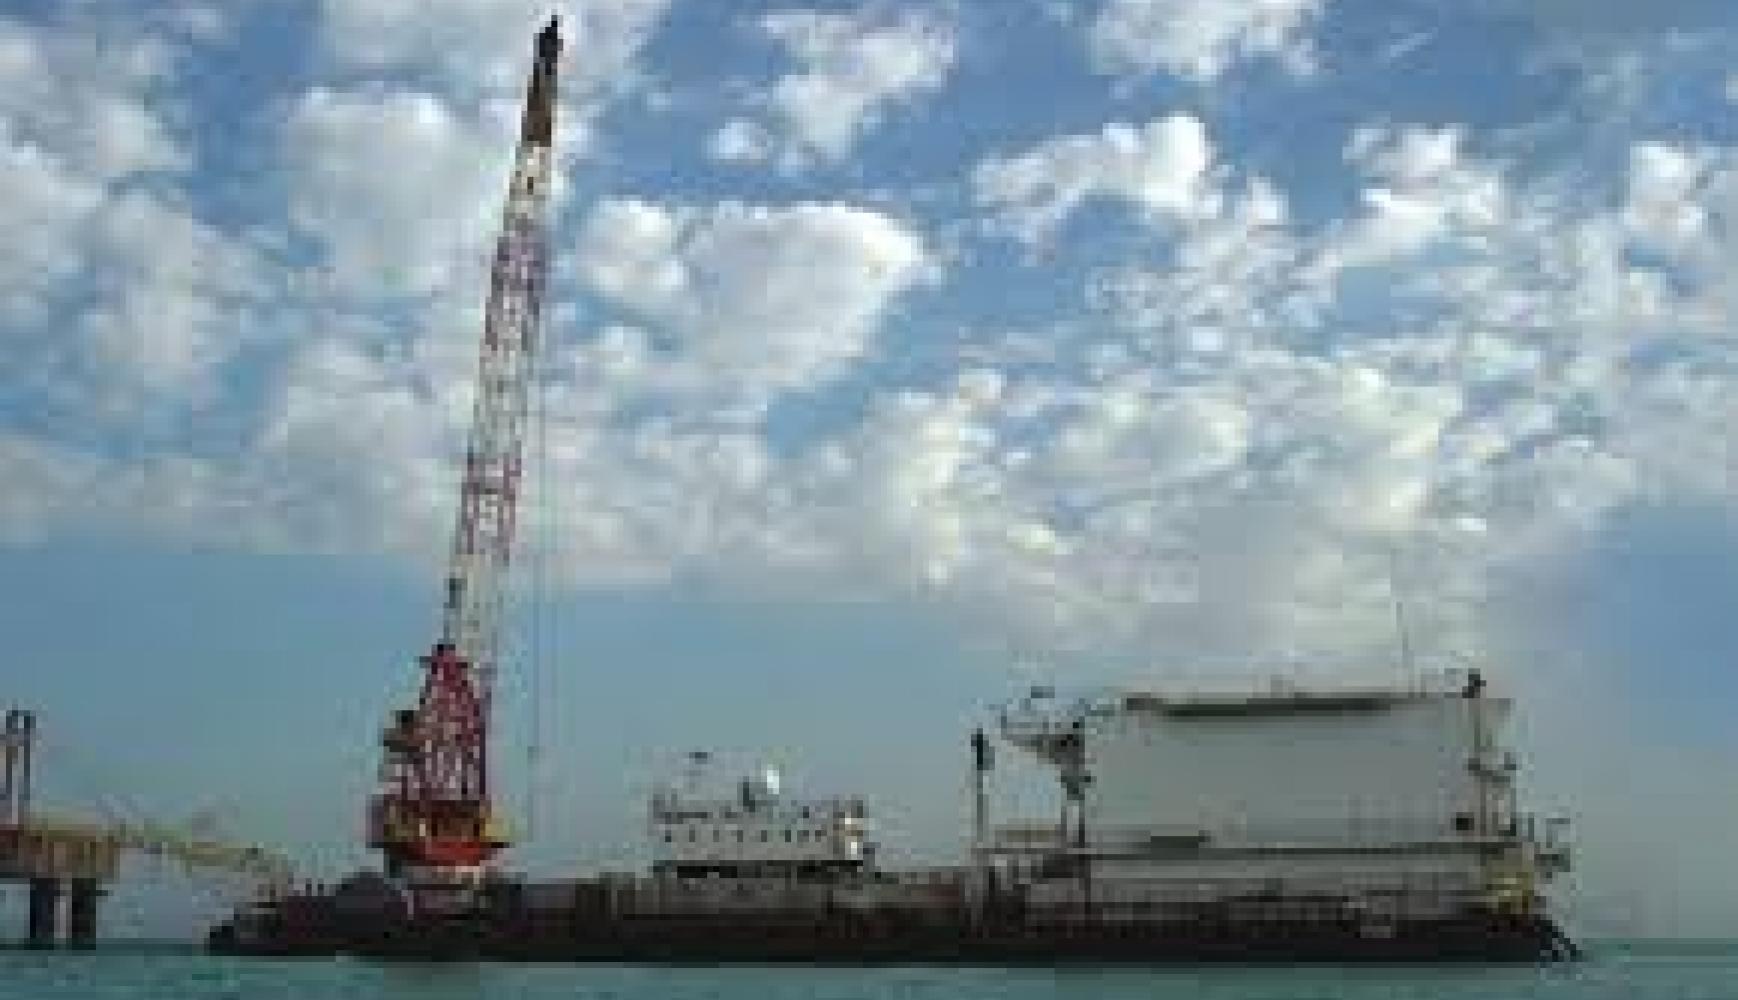 KHAN KH-A1 Accomodation Crane Barge